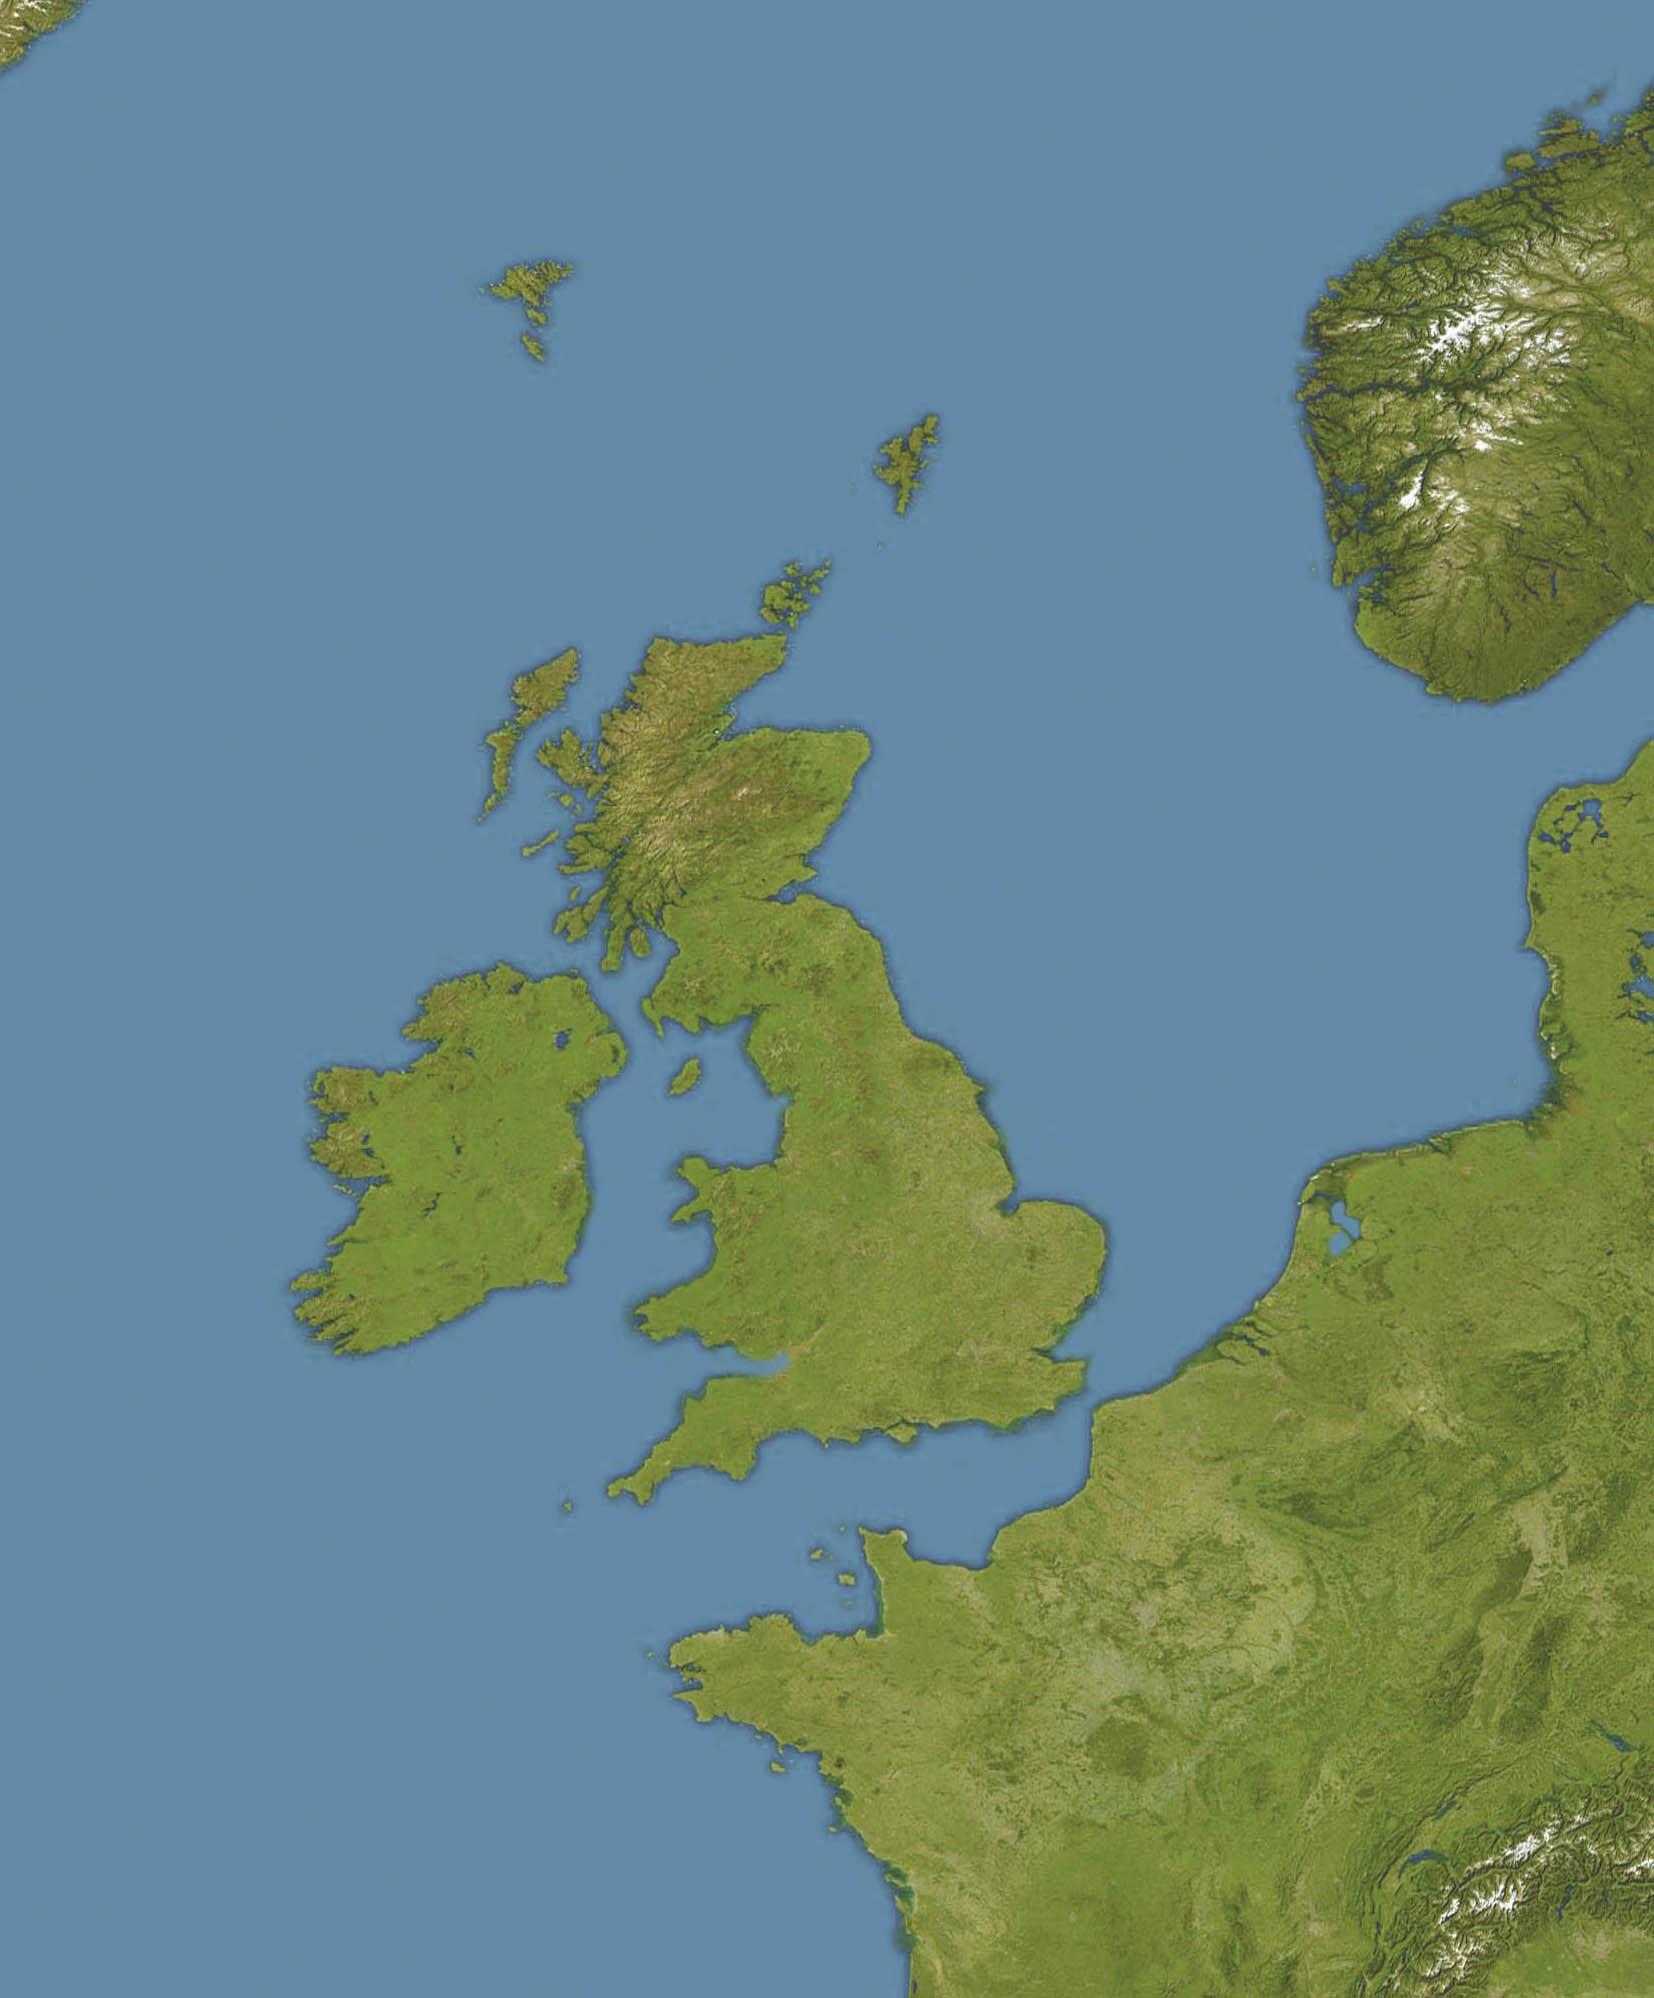 FileOceans Around British Isles Satellite Image Location Mapjpg - Satellite location map